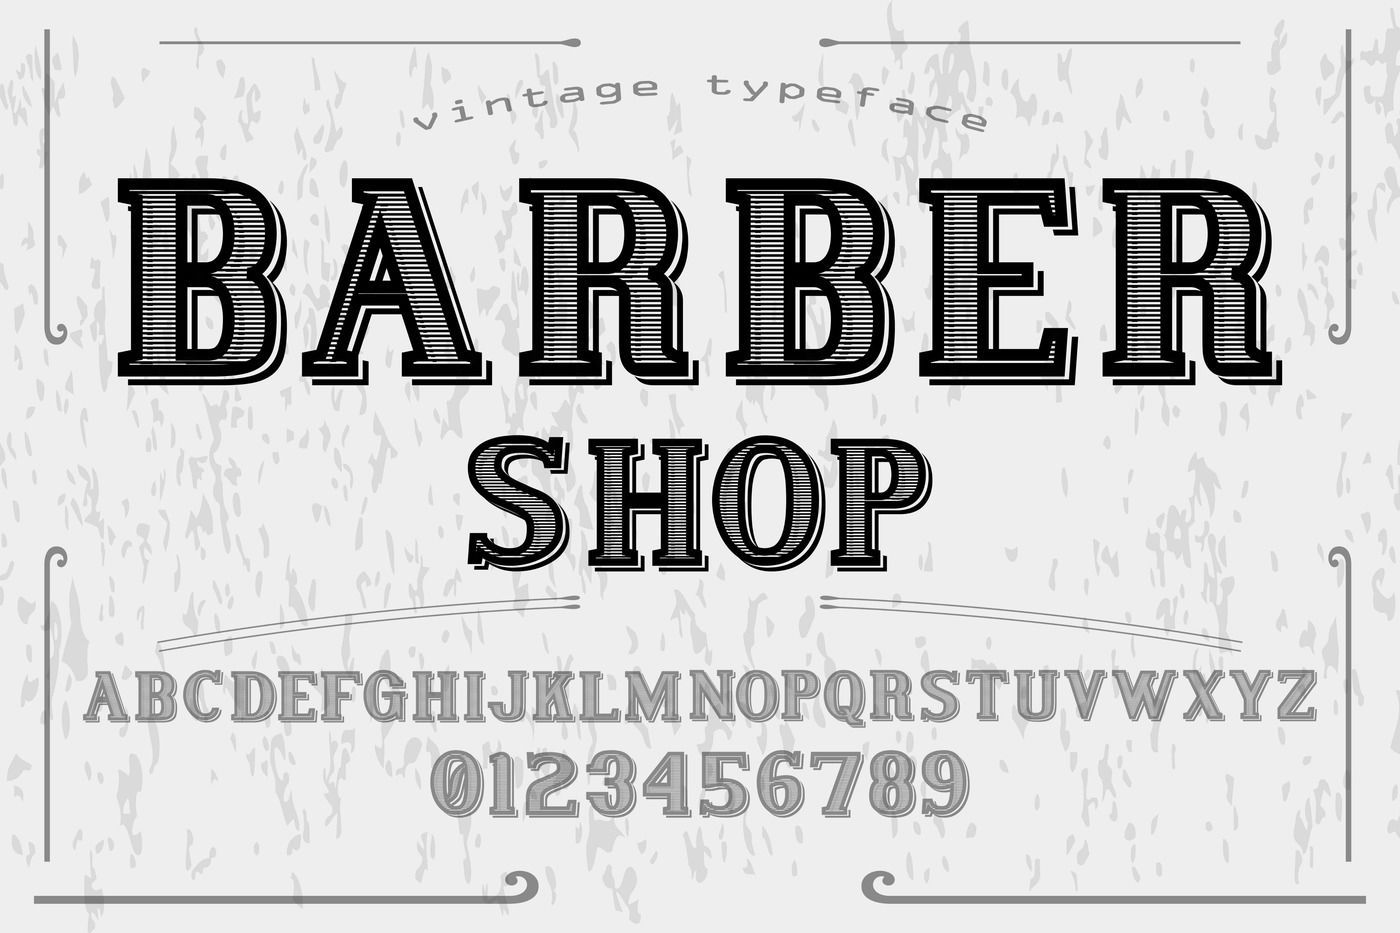 Vintage Alphabet Typeface Handcrafted Vector Label Design Barber By Vintage Font Thehungryjpeg Com Handcrafted Affiliat In 2020 With Images Vintage Fonts Label Design Typeface